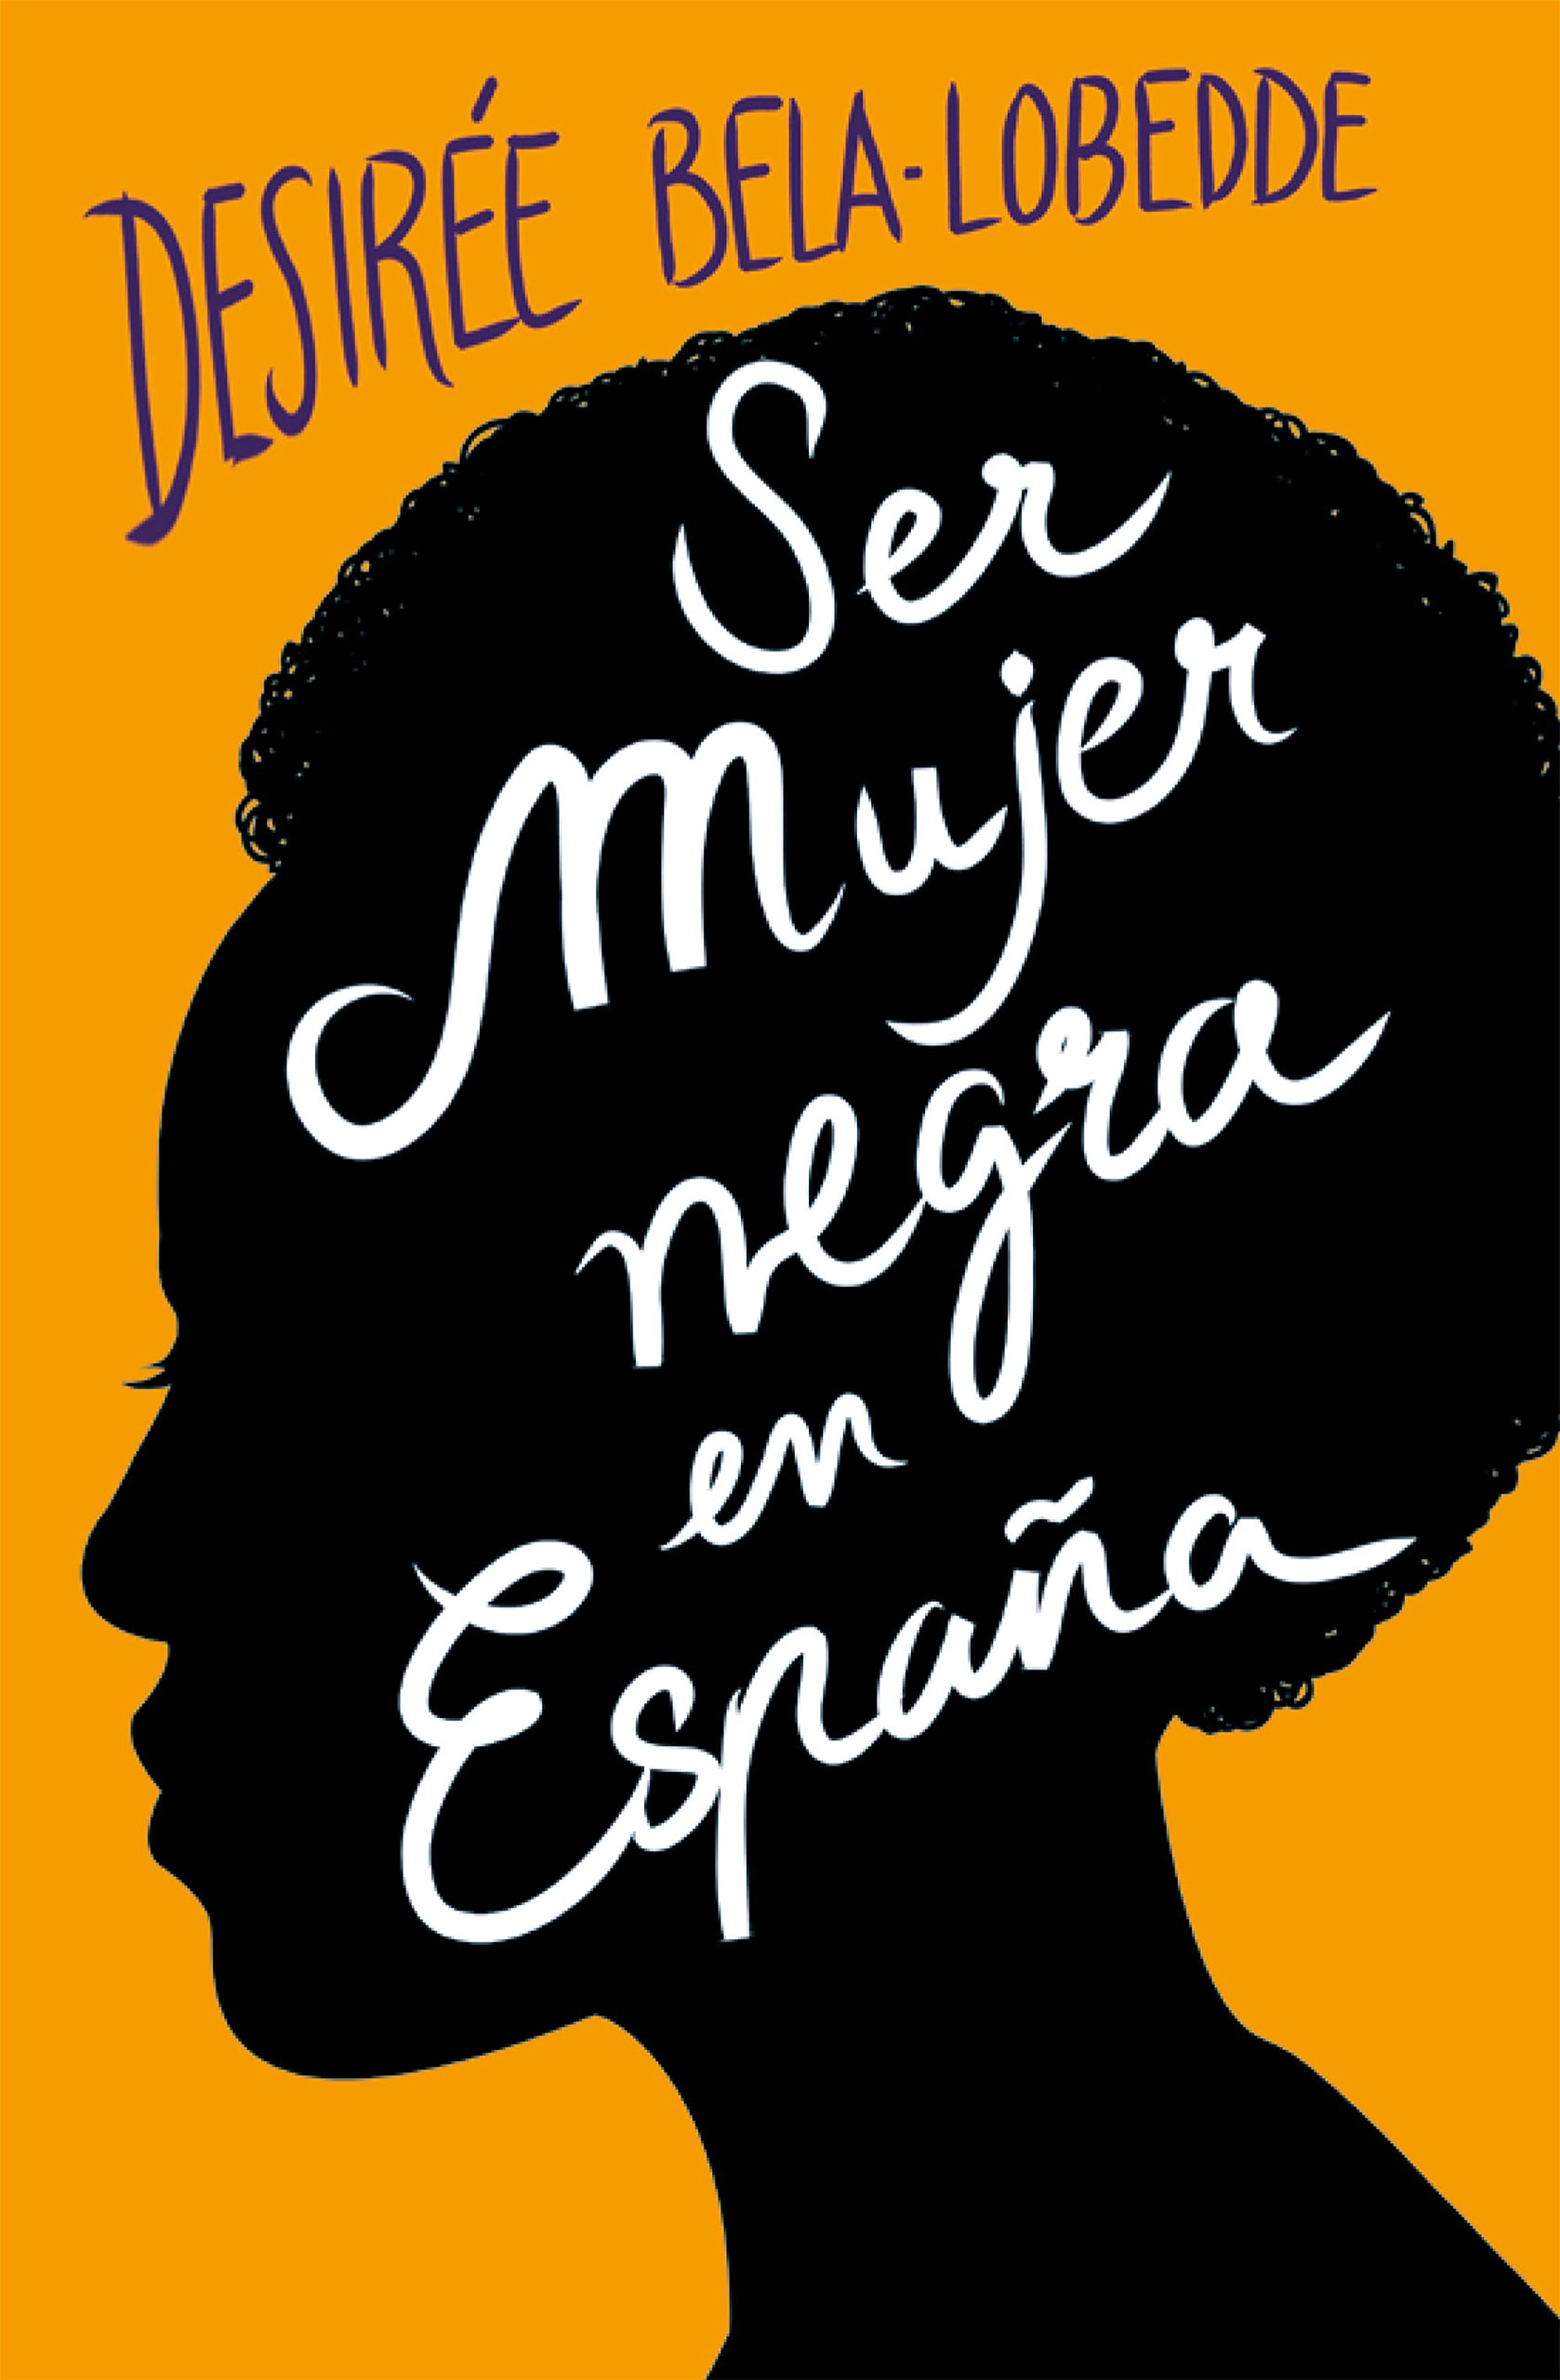 Ser mujer negra en España (Plan B): Amazon.es: Bela-Lobedde, Desirée: Libros